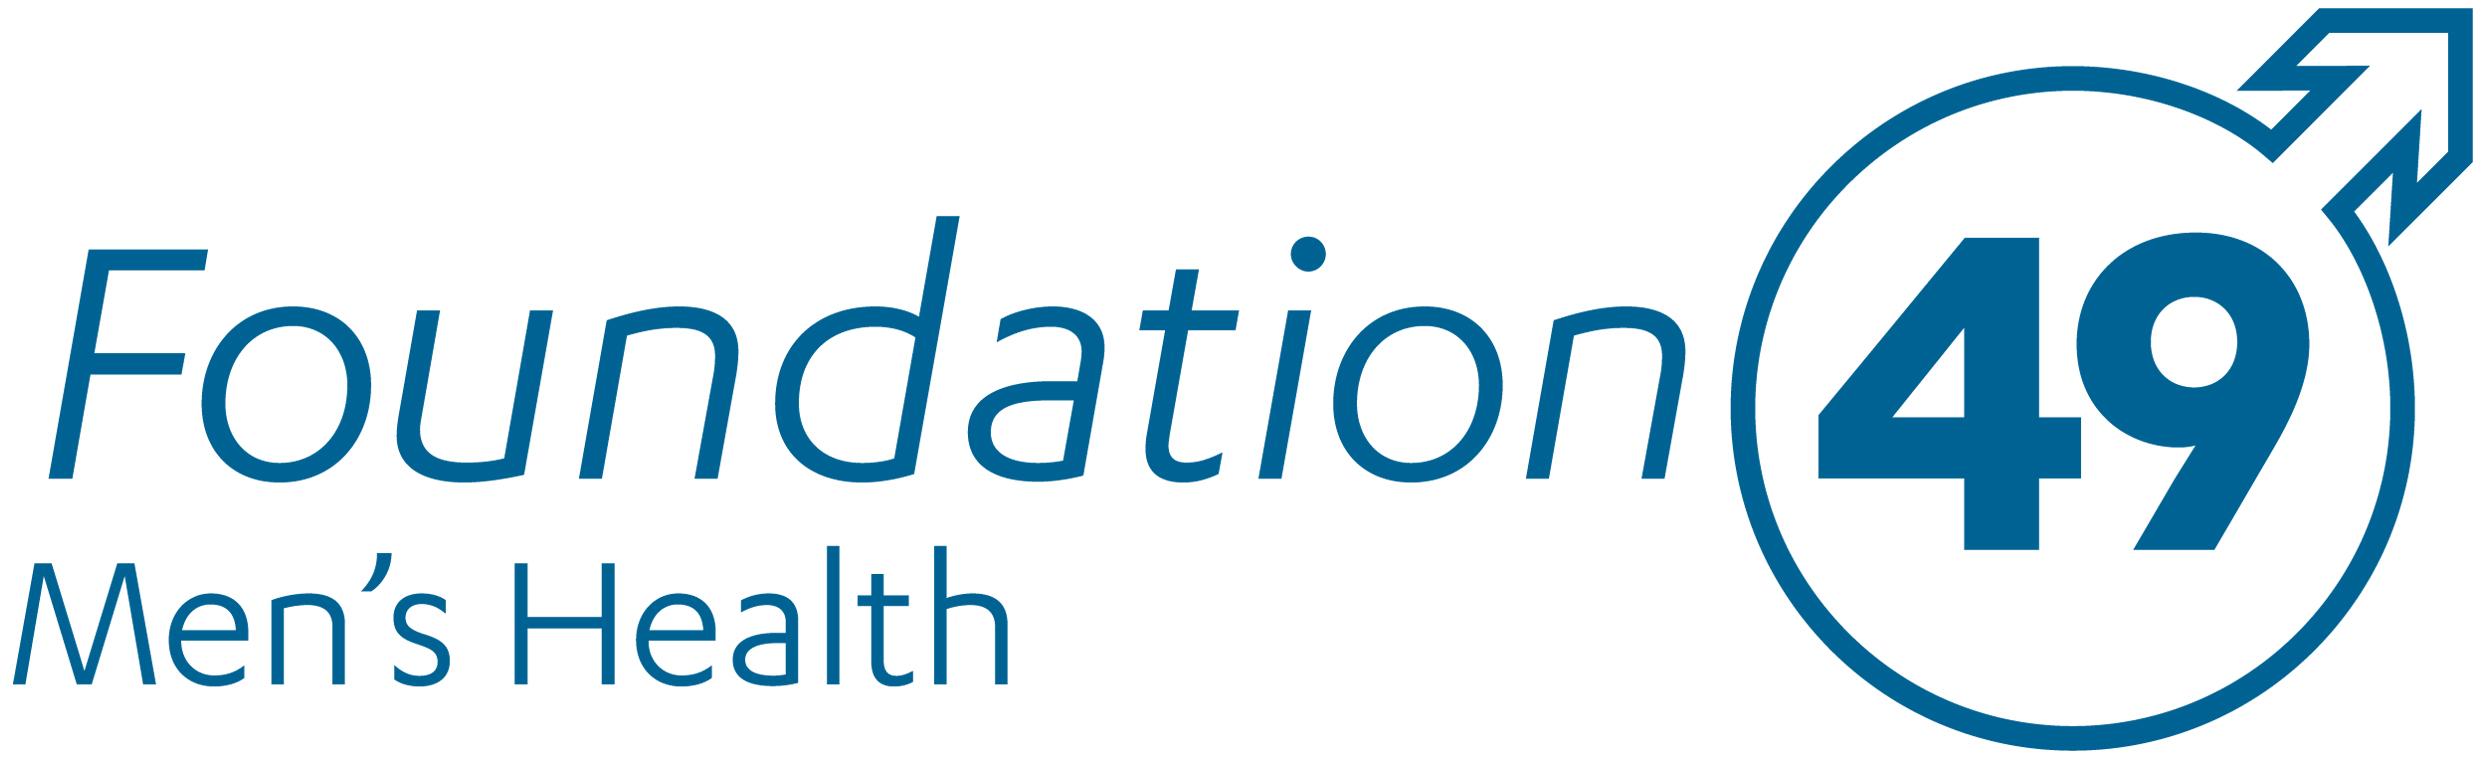 Foundation 49 Mens Health